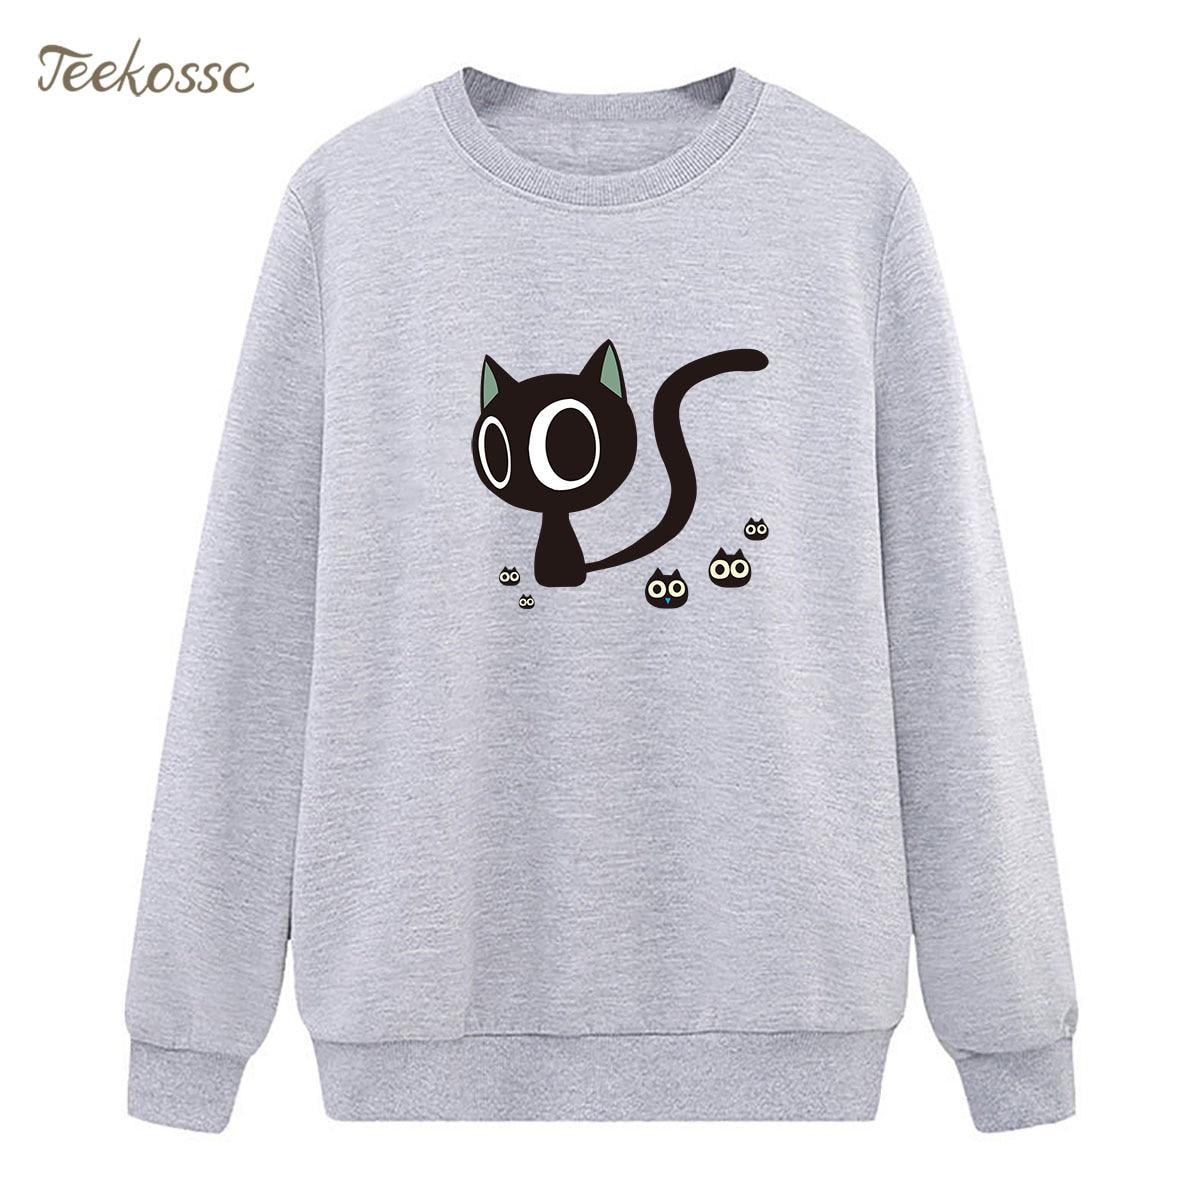 Kawaii Cat Sweatshirts Women Cute Hoodie 2018 Winter Autumn Lady Pullover Fleece Warm Hipster Sportswear Harajuku Brand Clothing